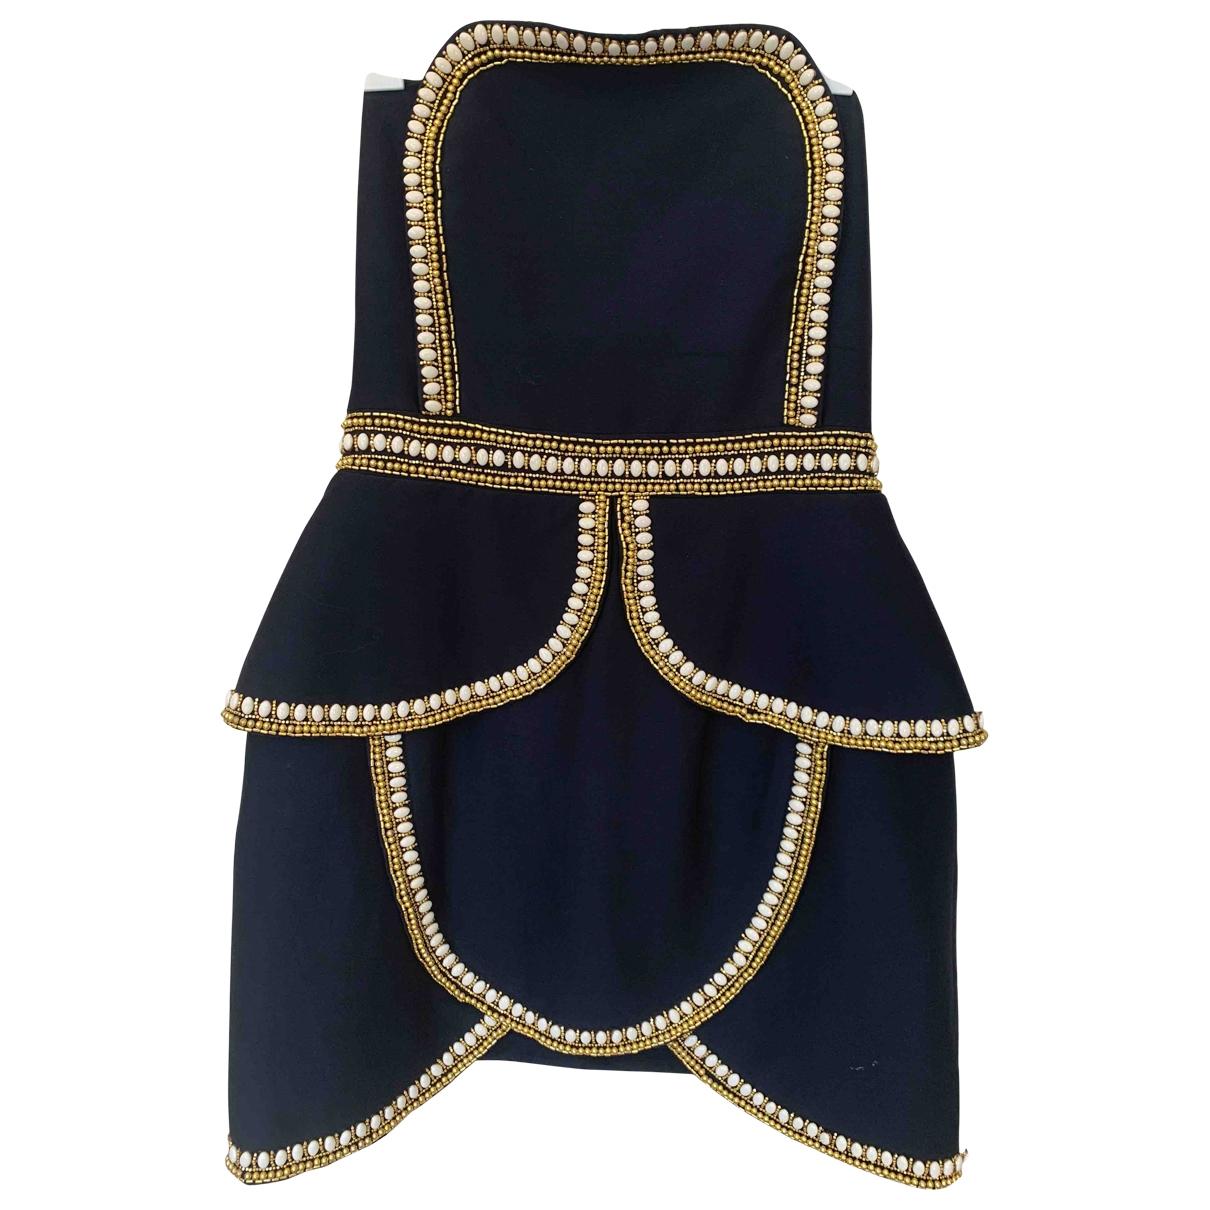 Sass & Bide \N Navy Cotton dress for Women 12 UK